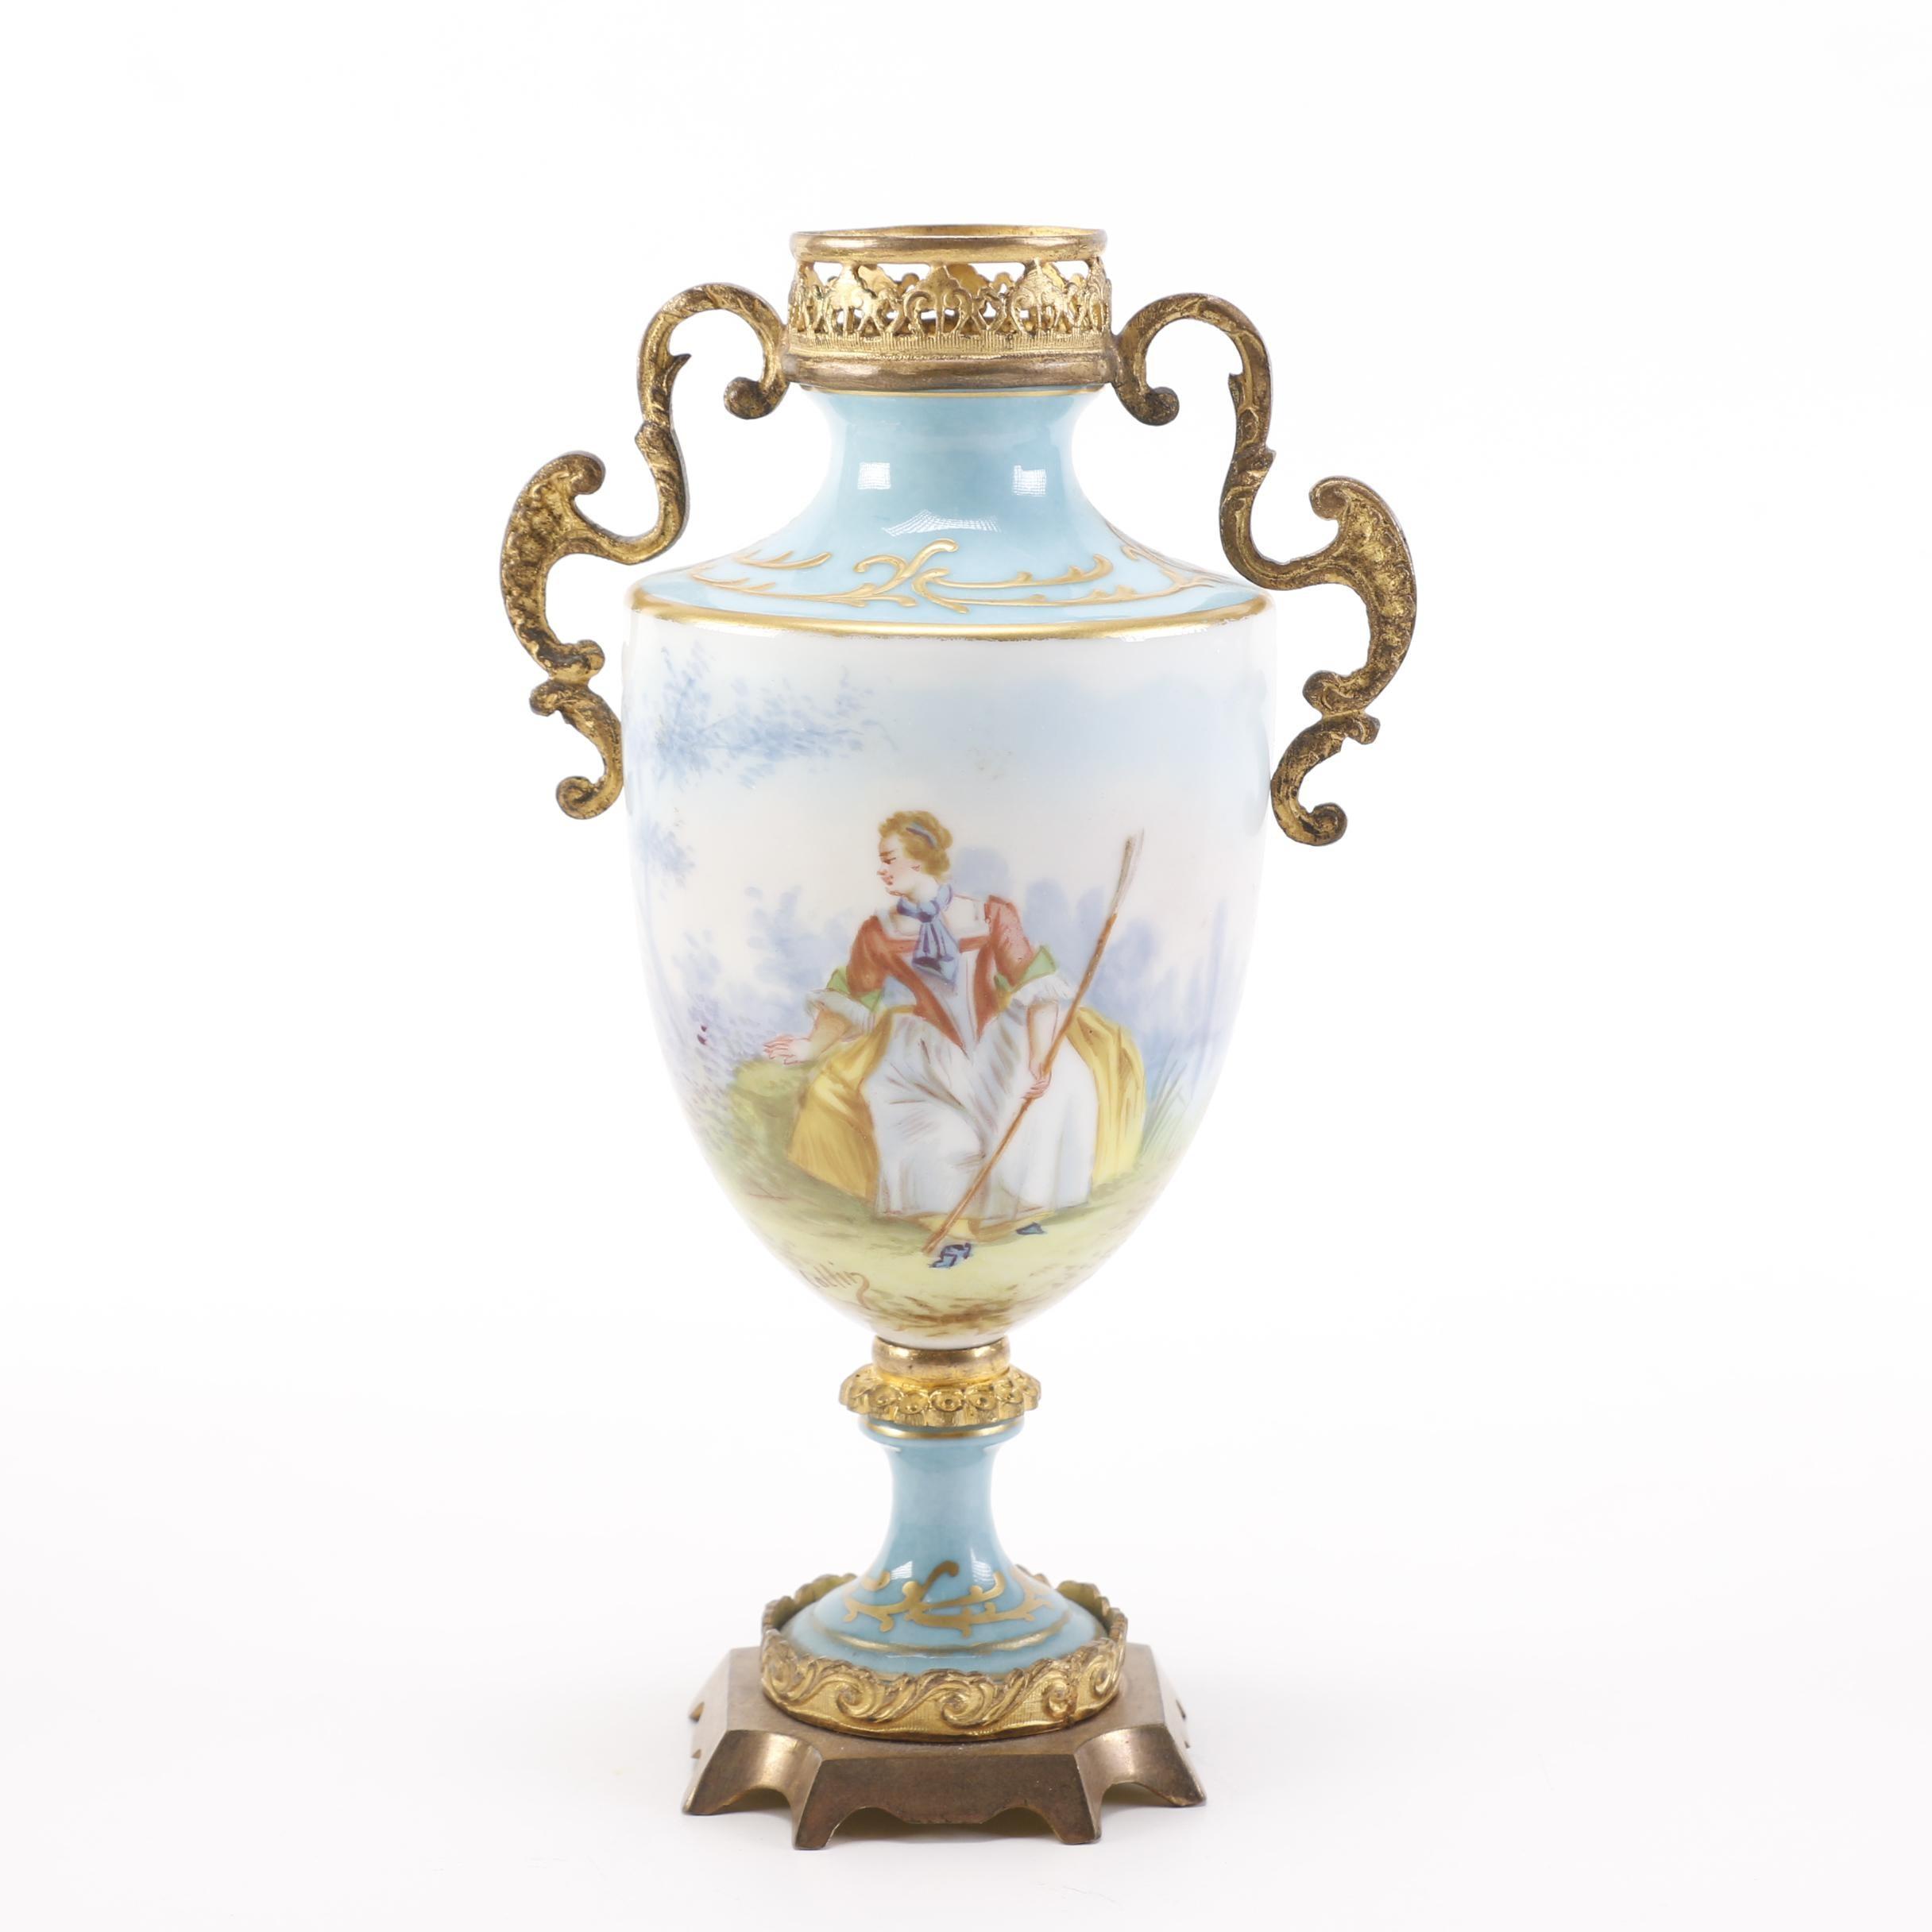 Antique Sèvres Porcelain Urn